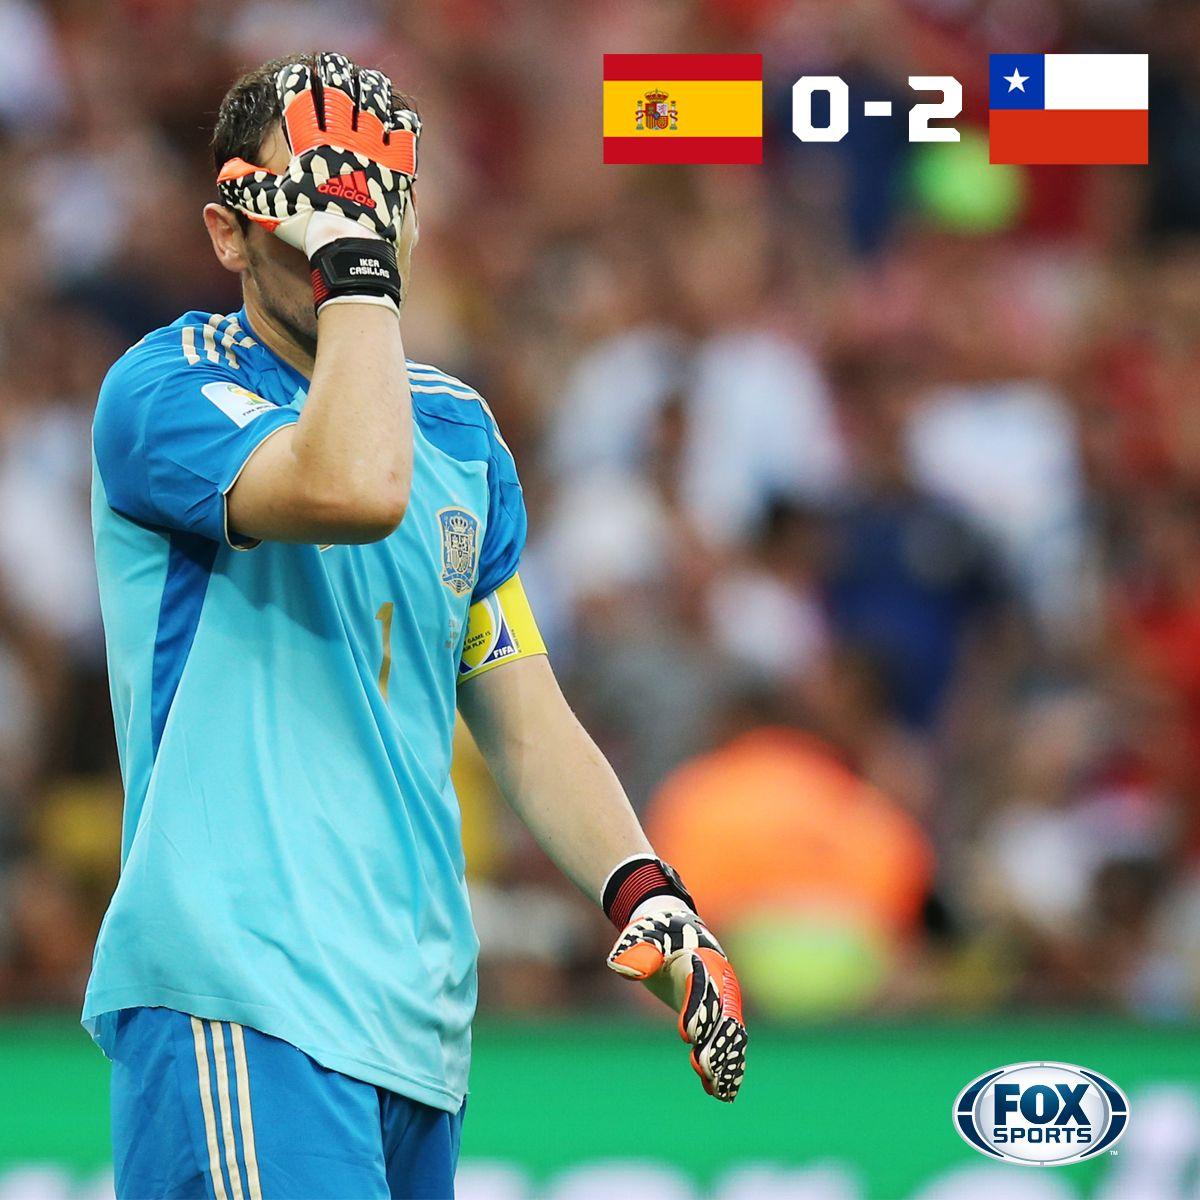 FOX Soccer Blog Photo Soccer, World cup 2014, Live soccer